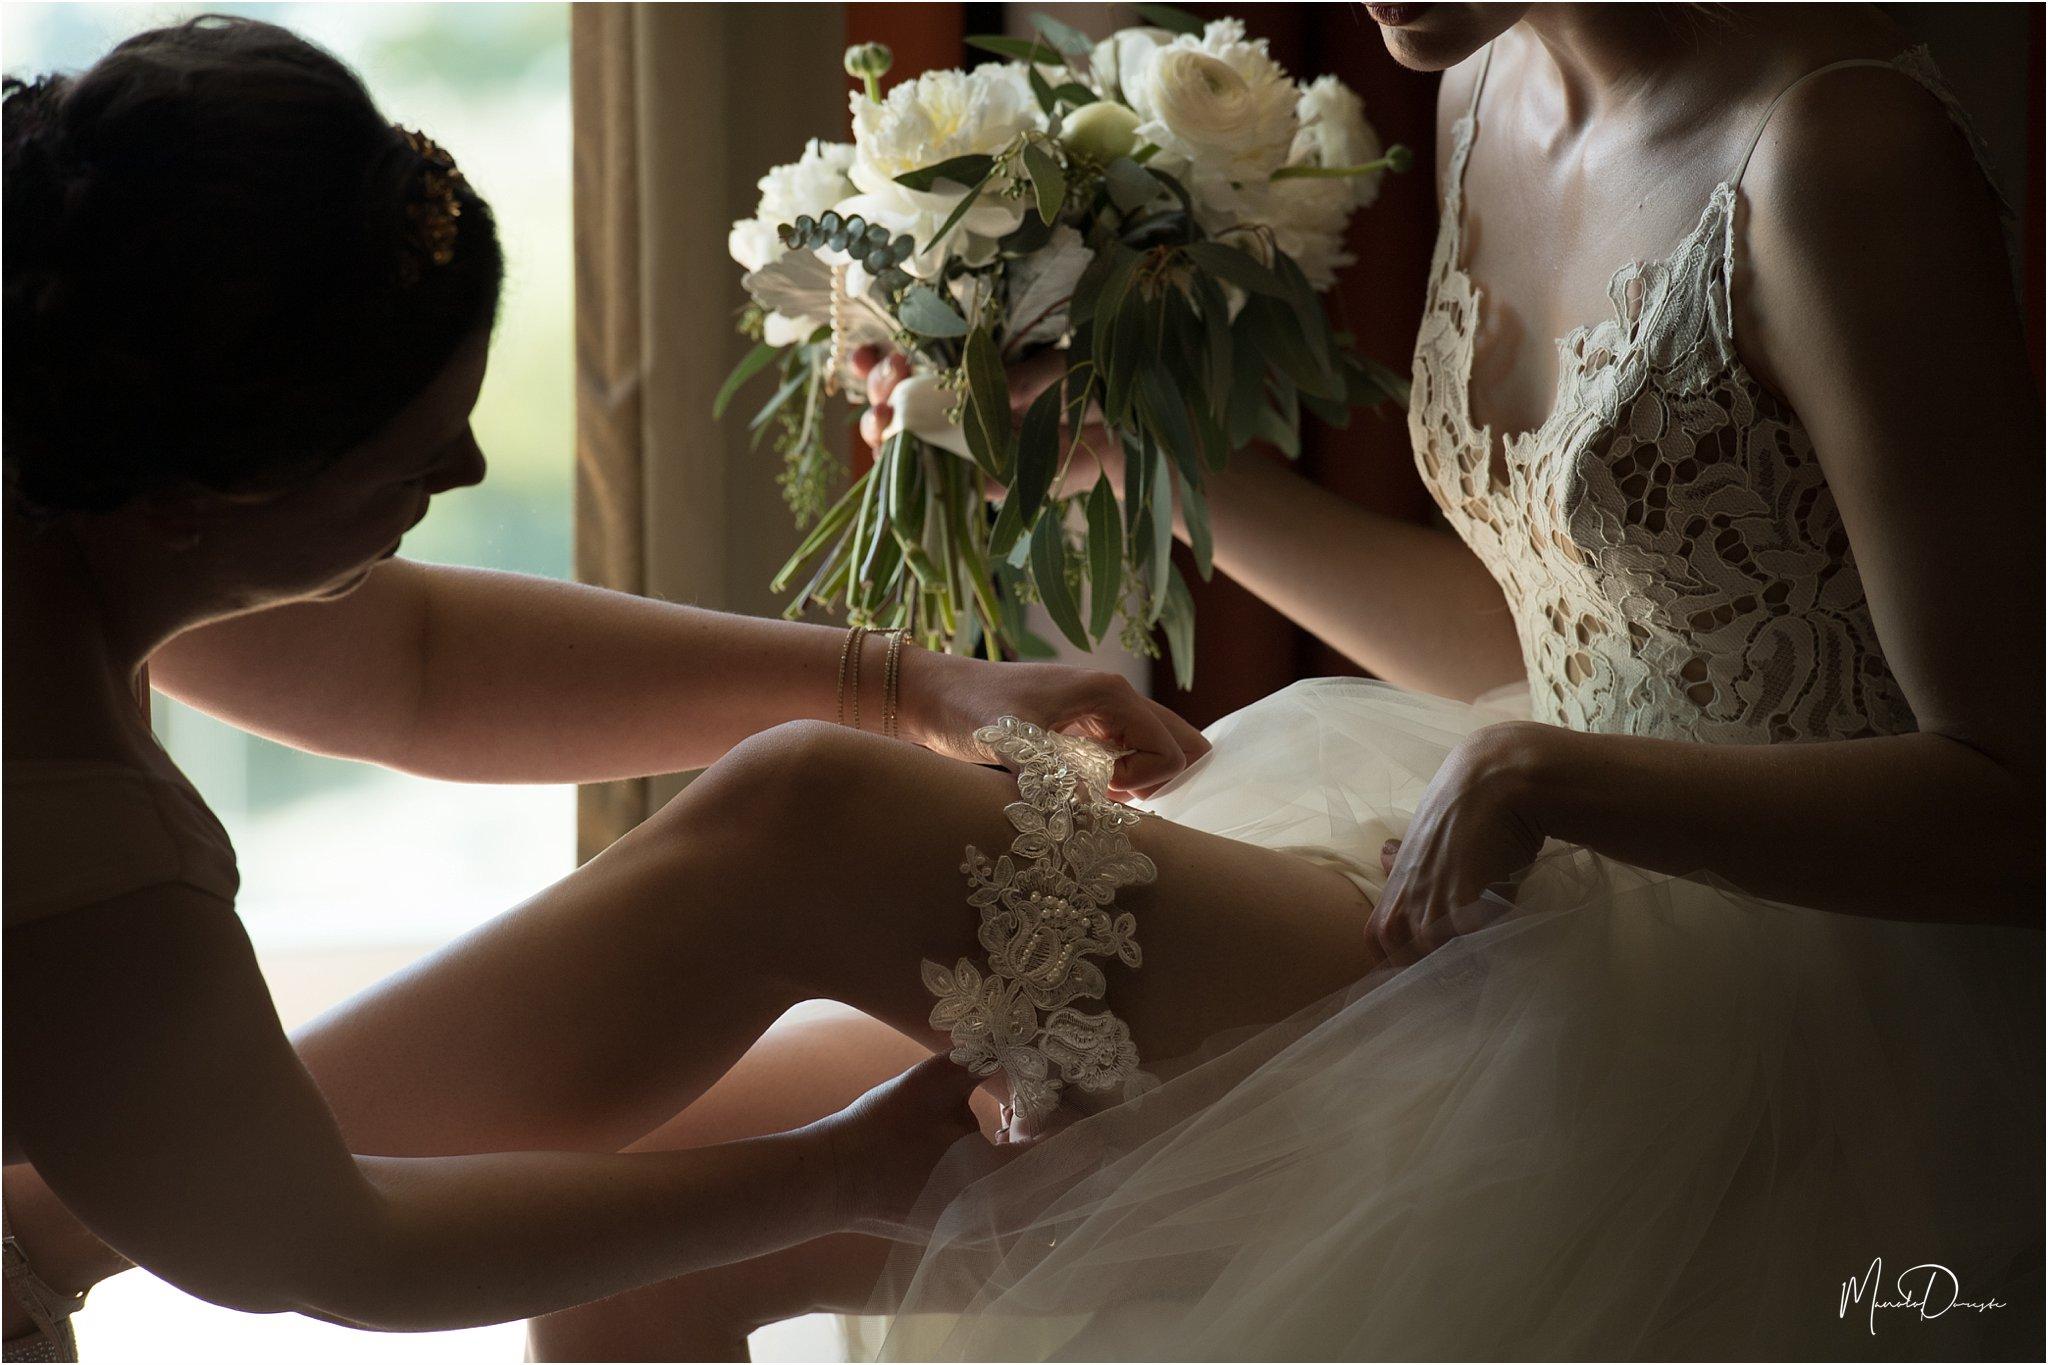 00876_ManoloDoreste_InFocusStudios_Wedding_Family_Photography_Miami_MiamiPhotographer.jpg